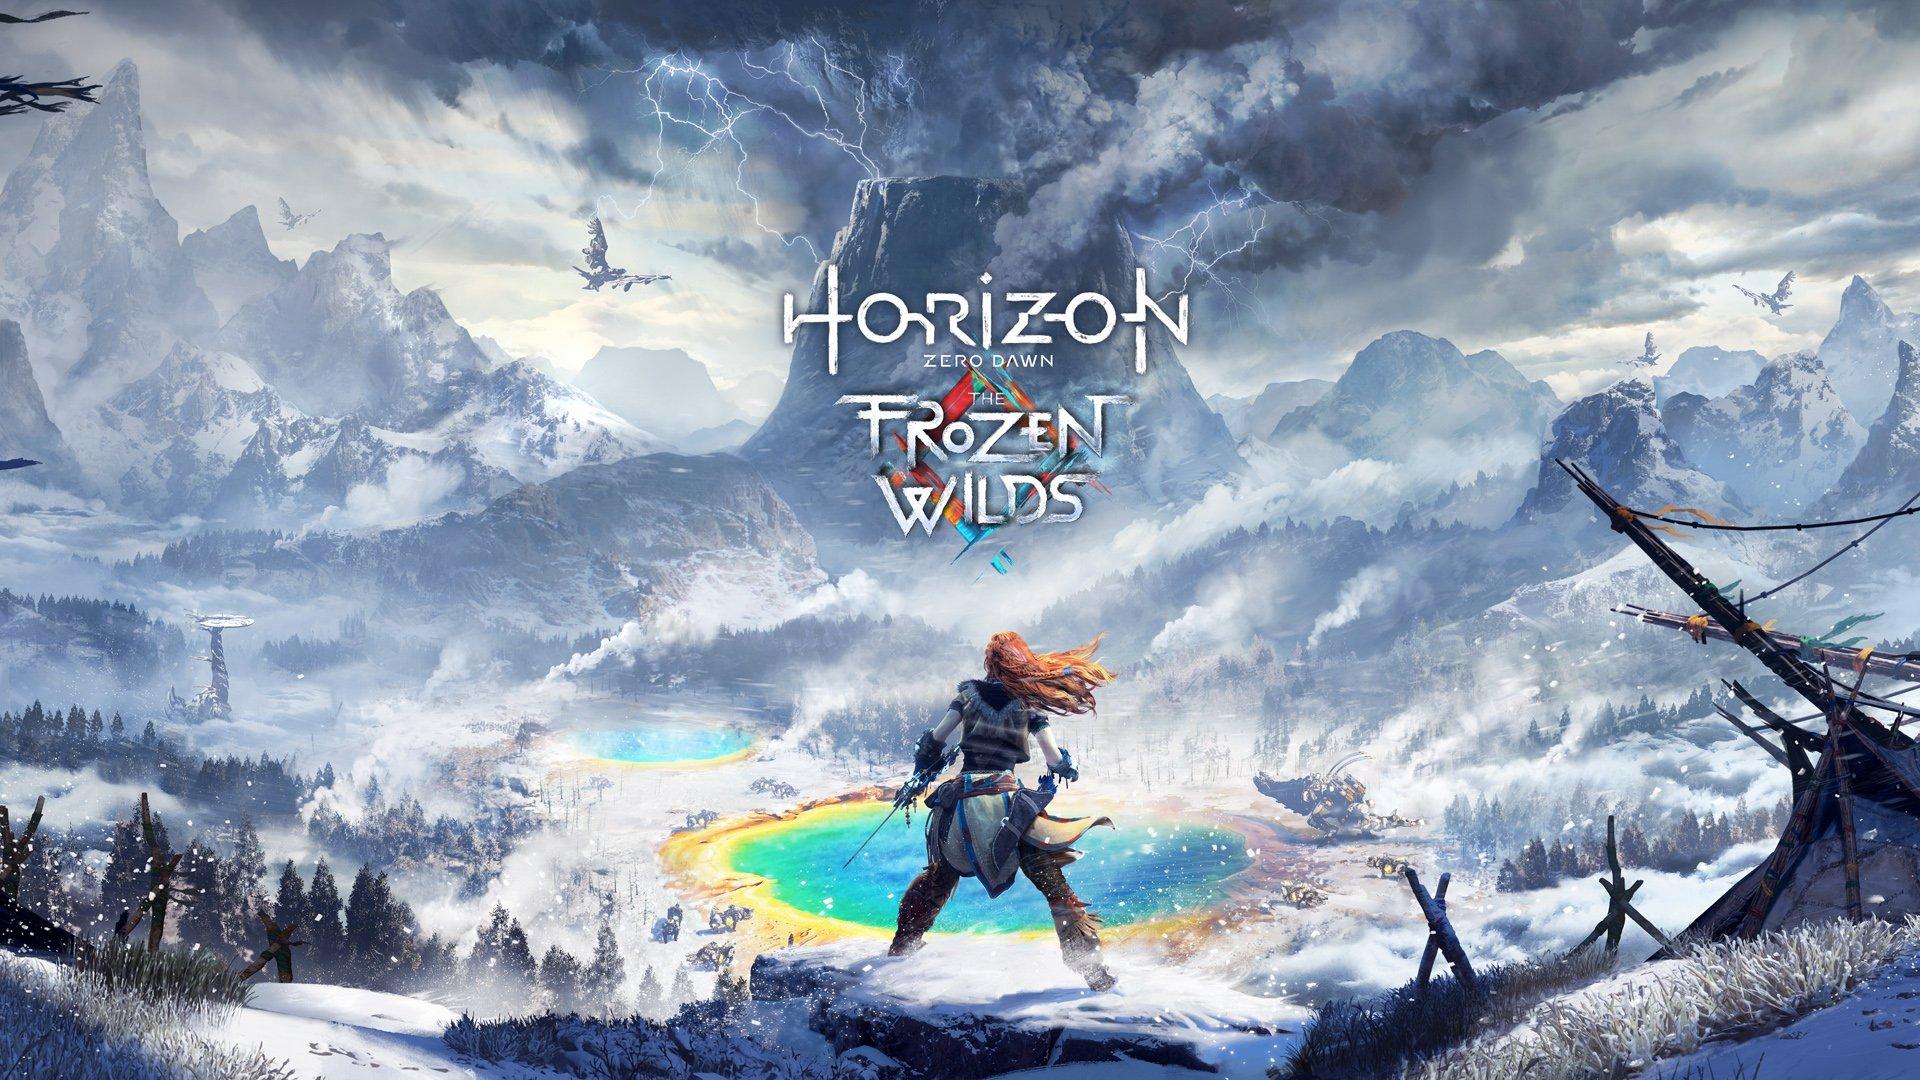 Horizon Zero Dawn, The Frozen Wilds, DLC, Sony, Guerrilla Games Playstation 4 Exclusive PS4